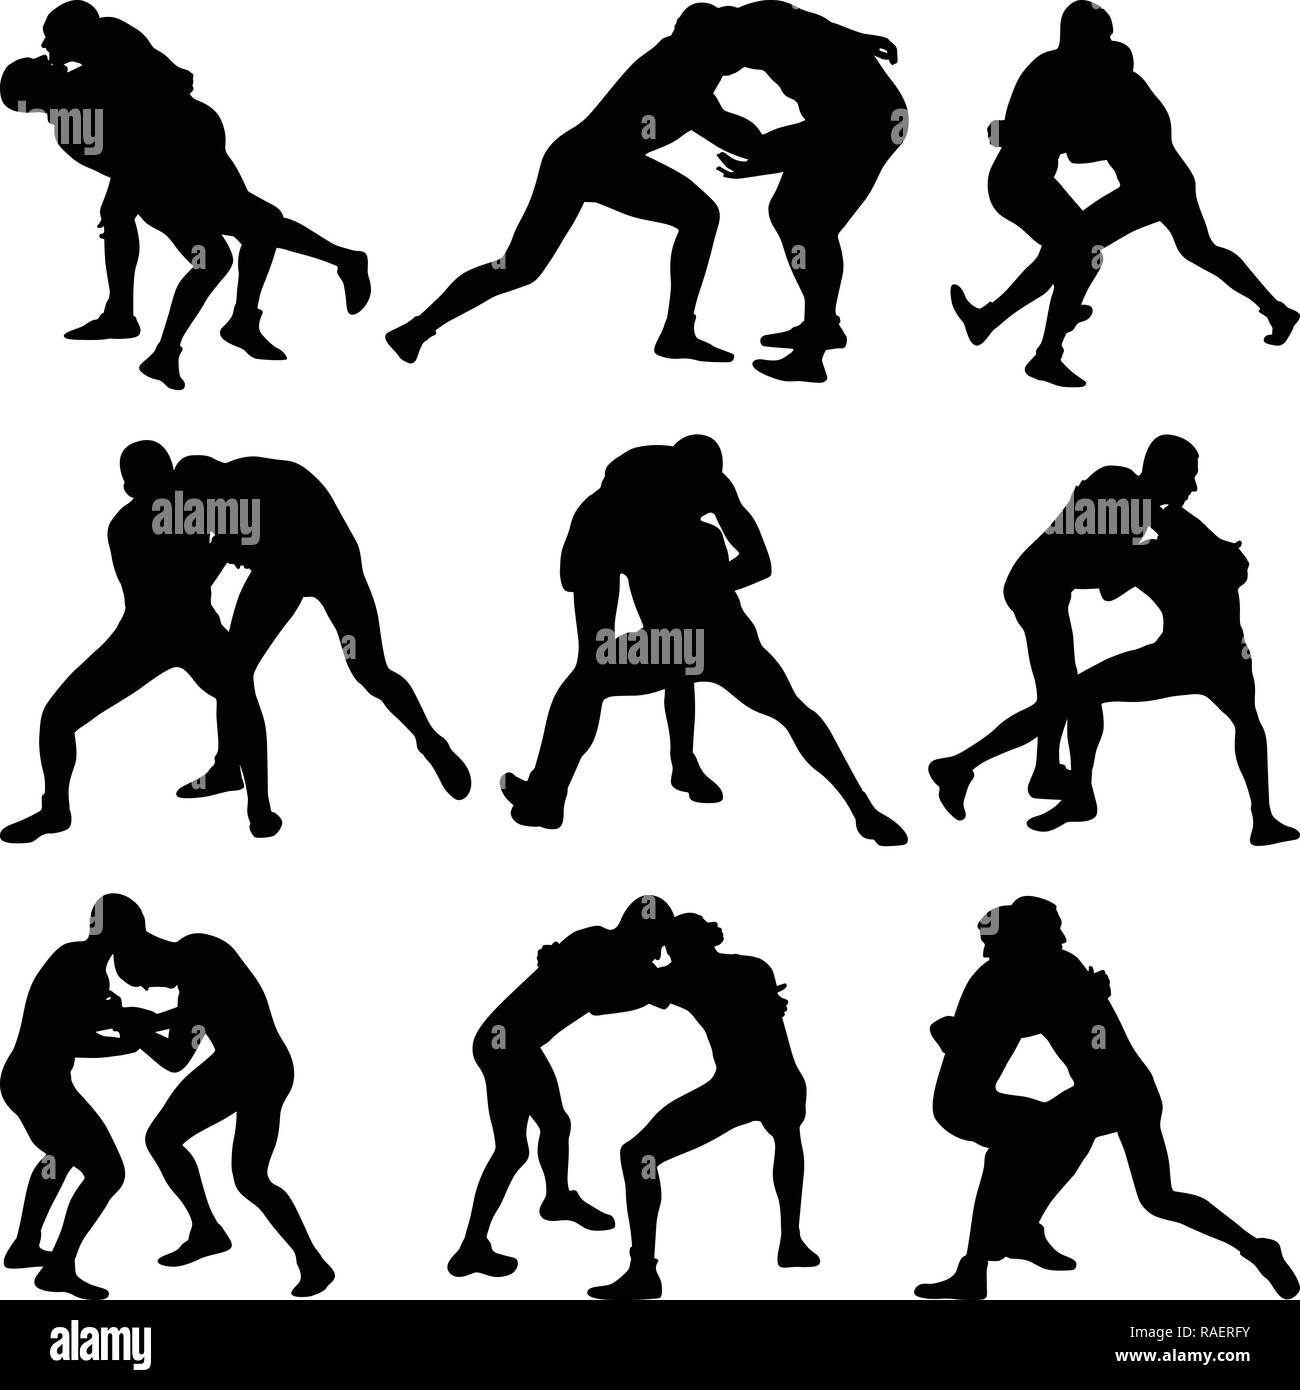 wrestling silhouette vector - Stock Image